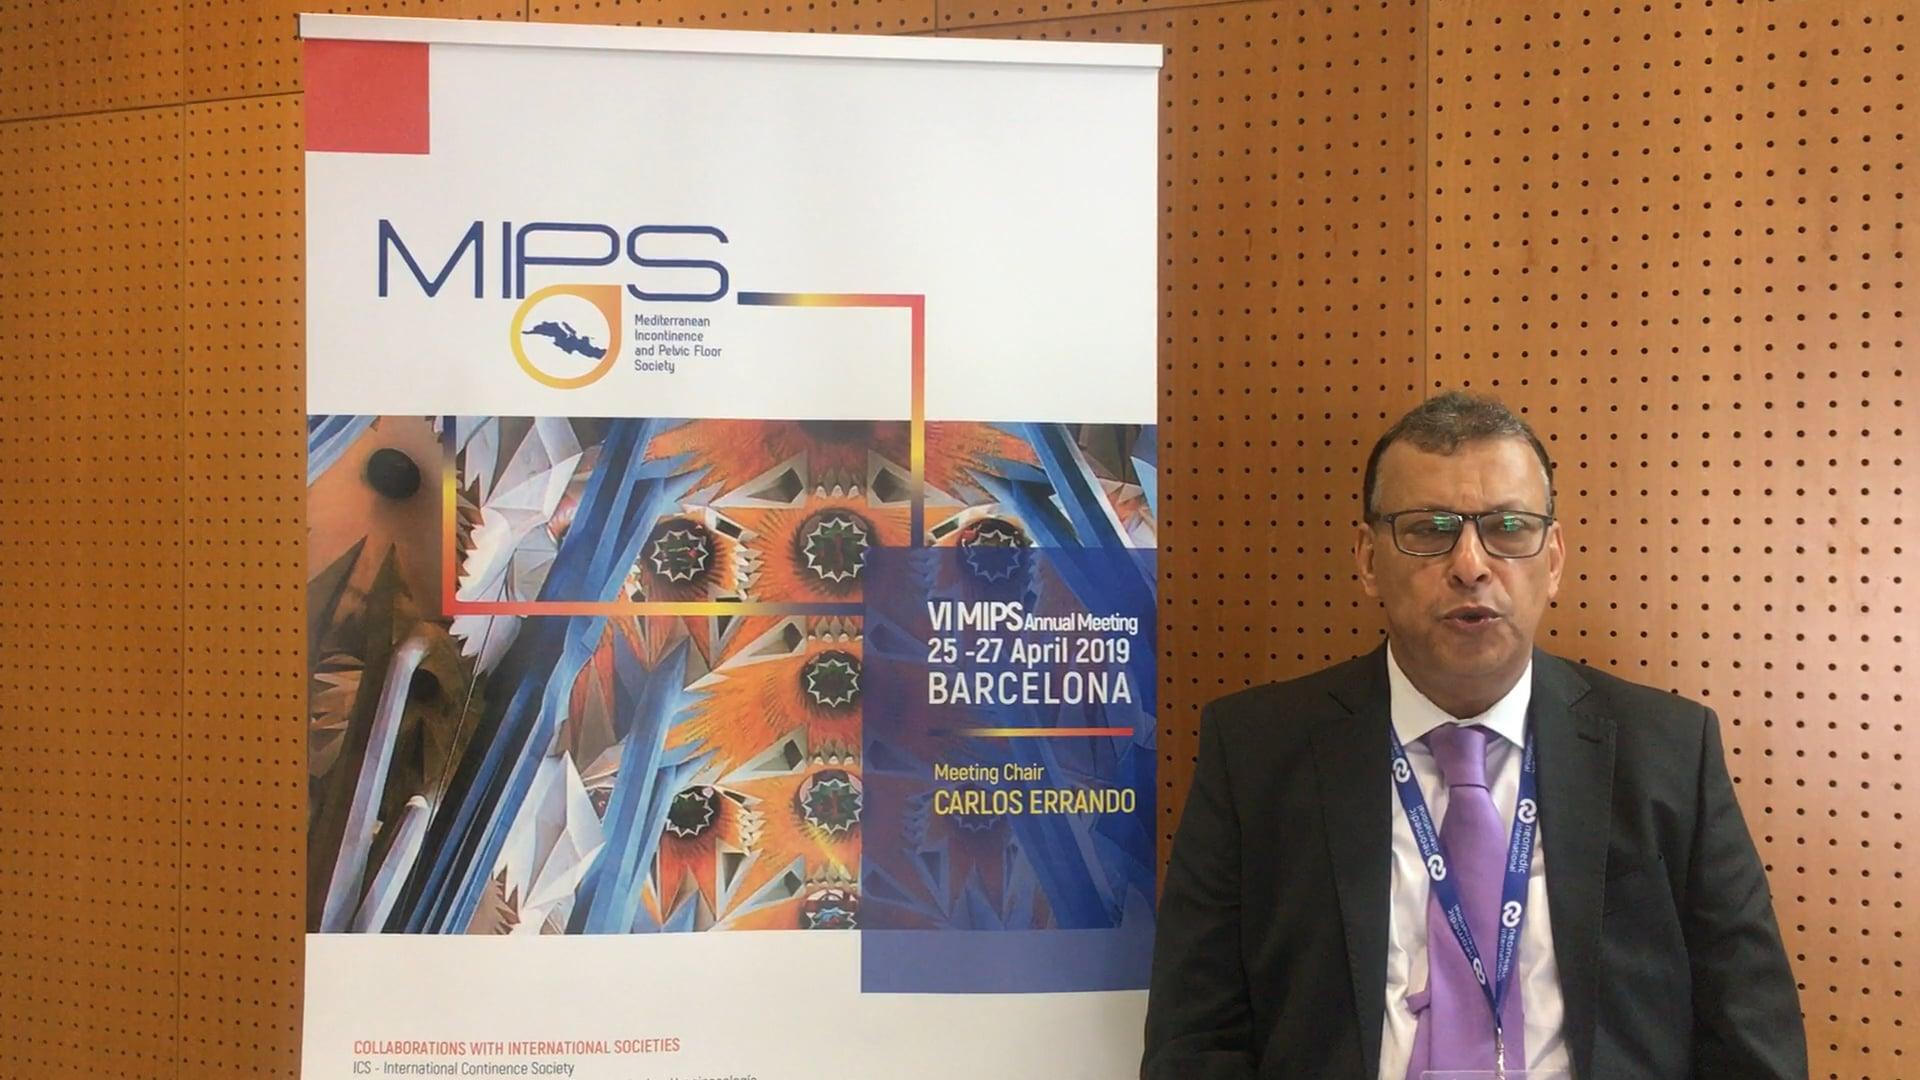 Diaa Rizk - MIPS President @ MIPS ANNUAL CONGRESS 2019   Barcellona - Arabic